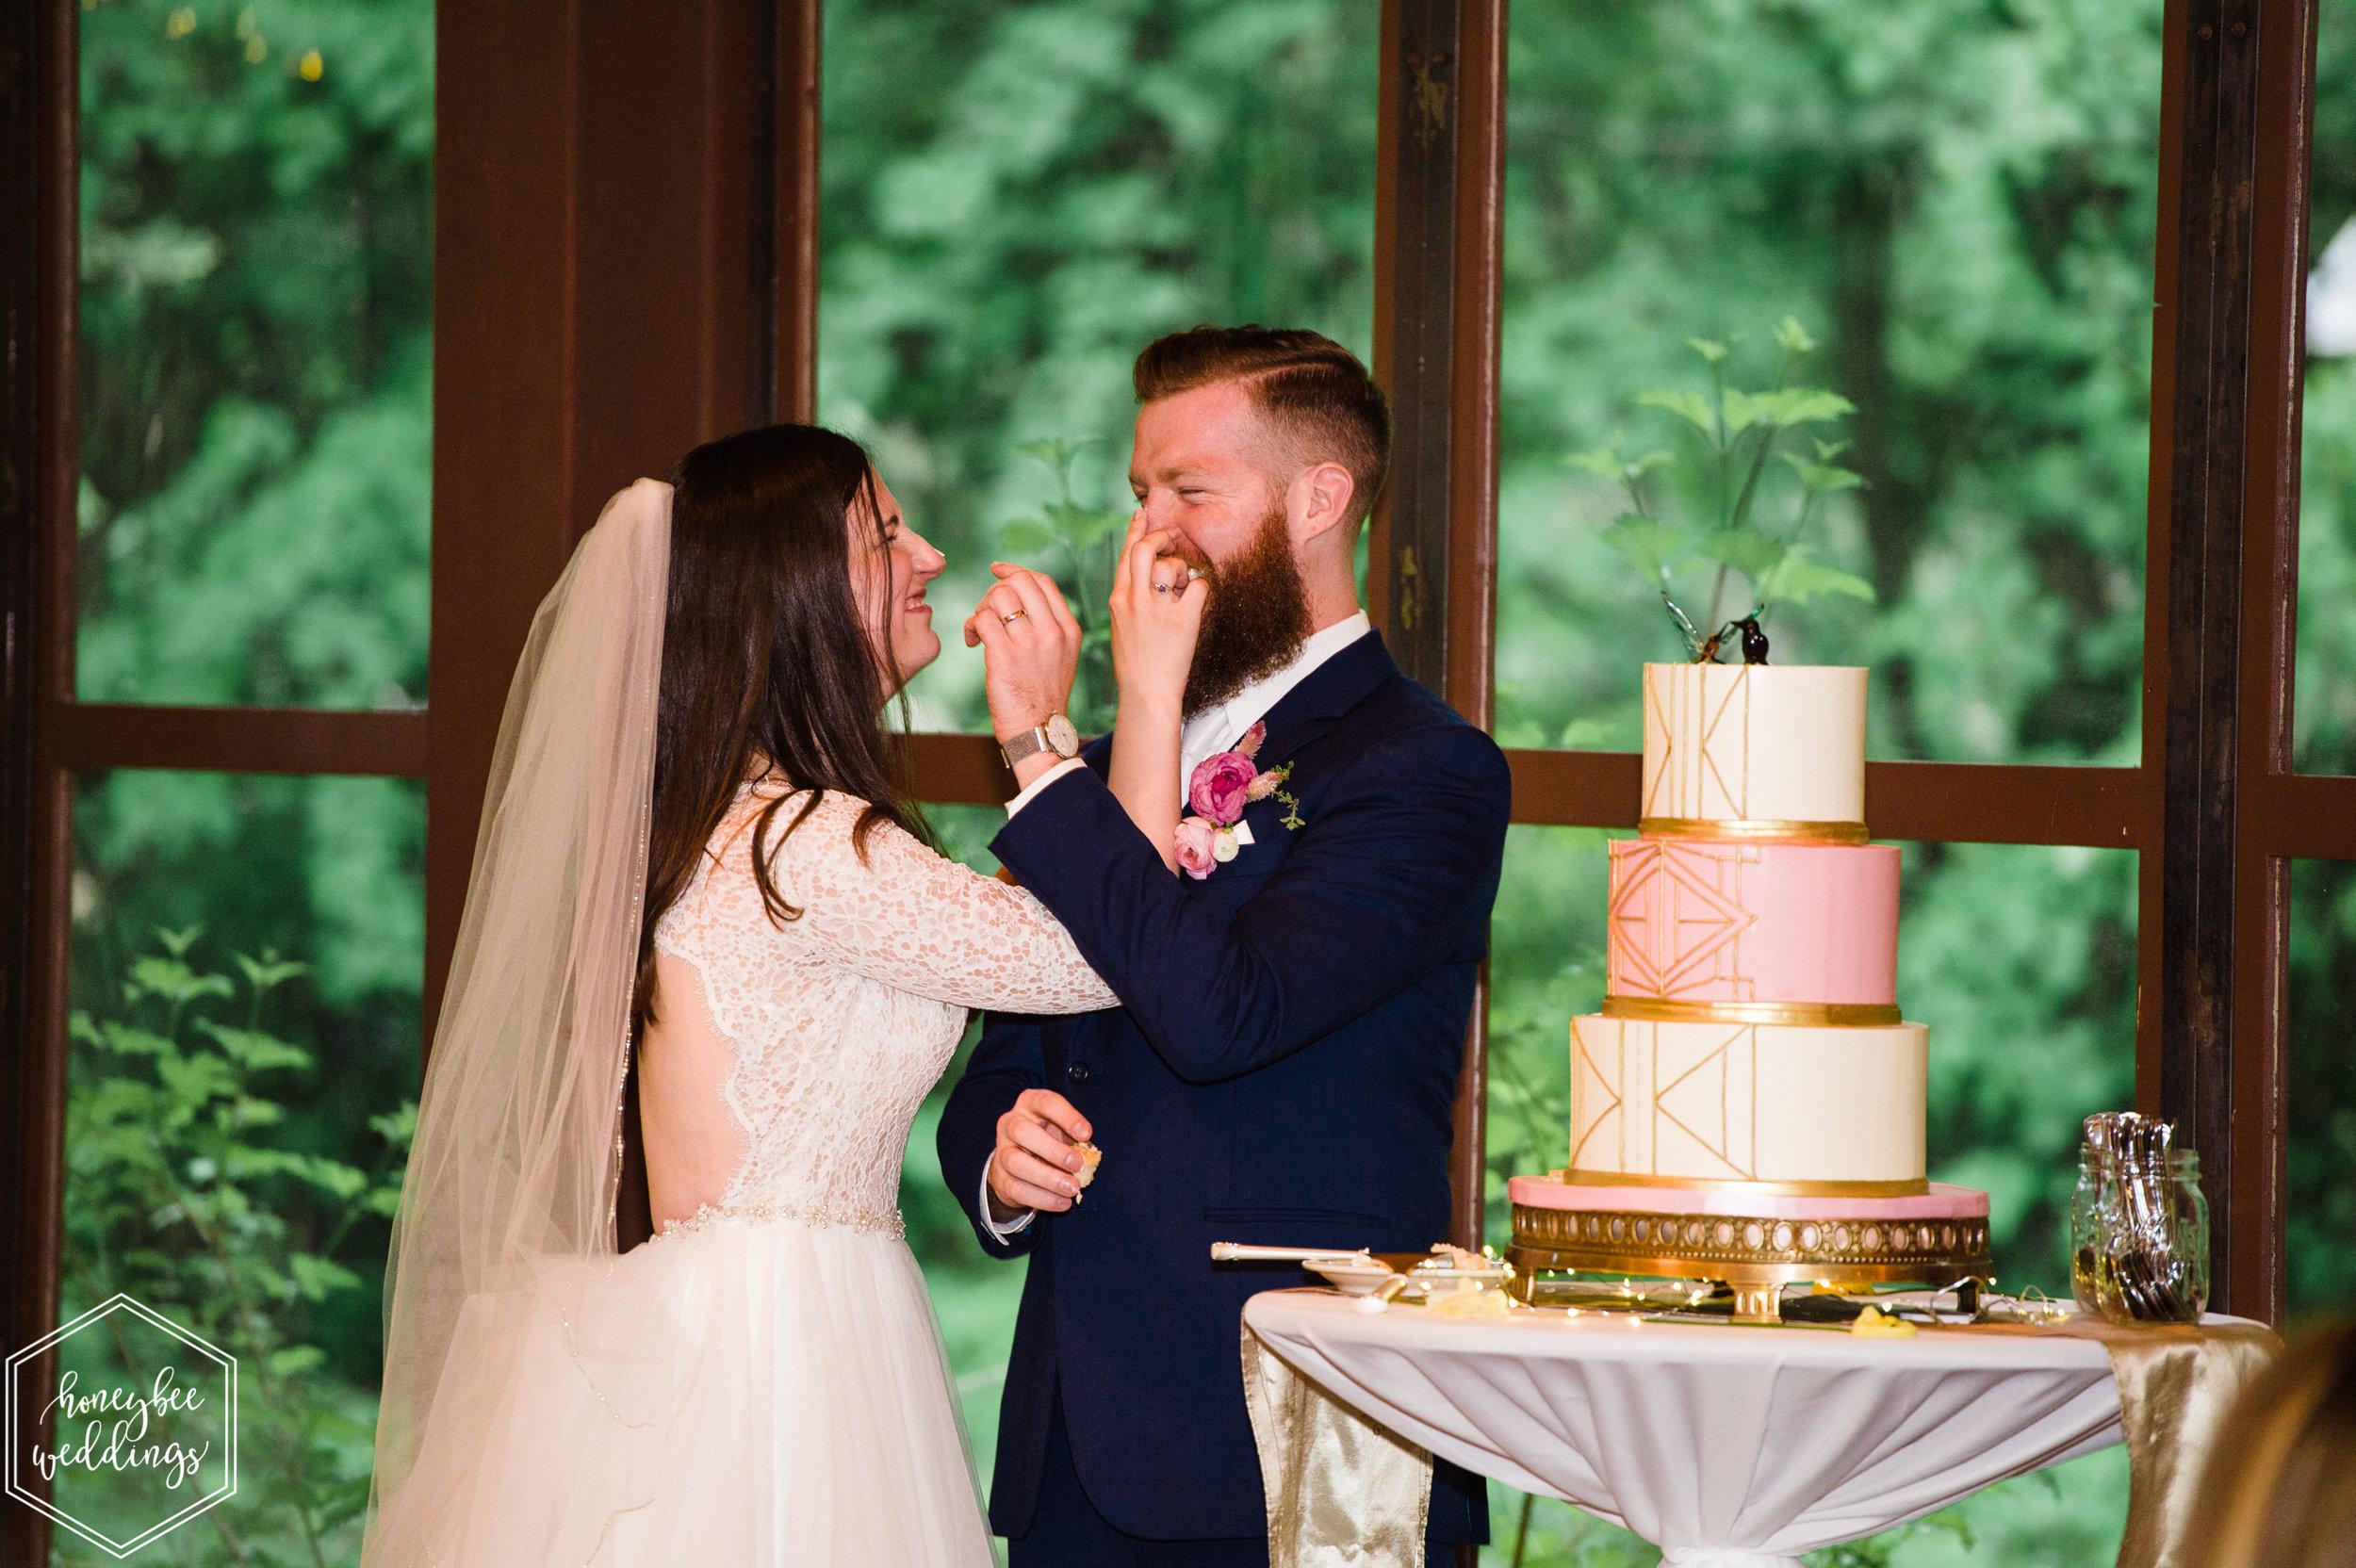 175Glacier National Park Wedding_Izaak Walton Inn Wedding_Honeybee Weddings_Norah & Kyle_June 08, 2019-1692.jpg